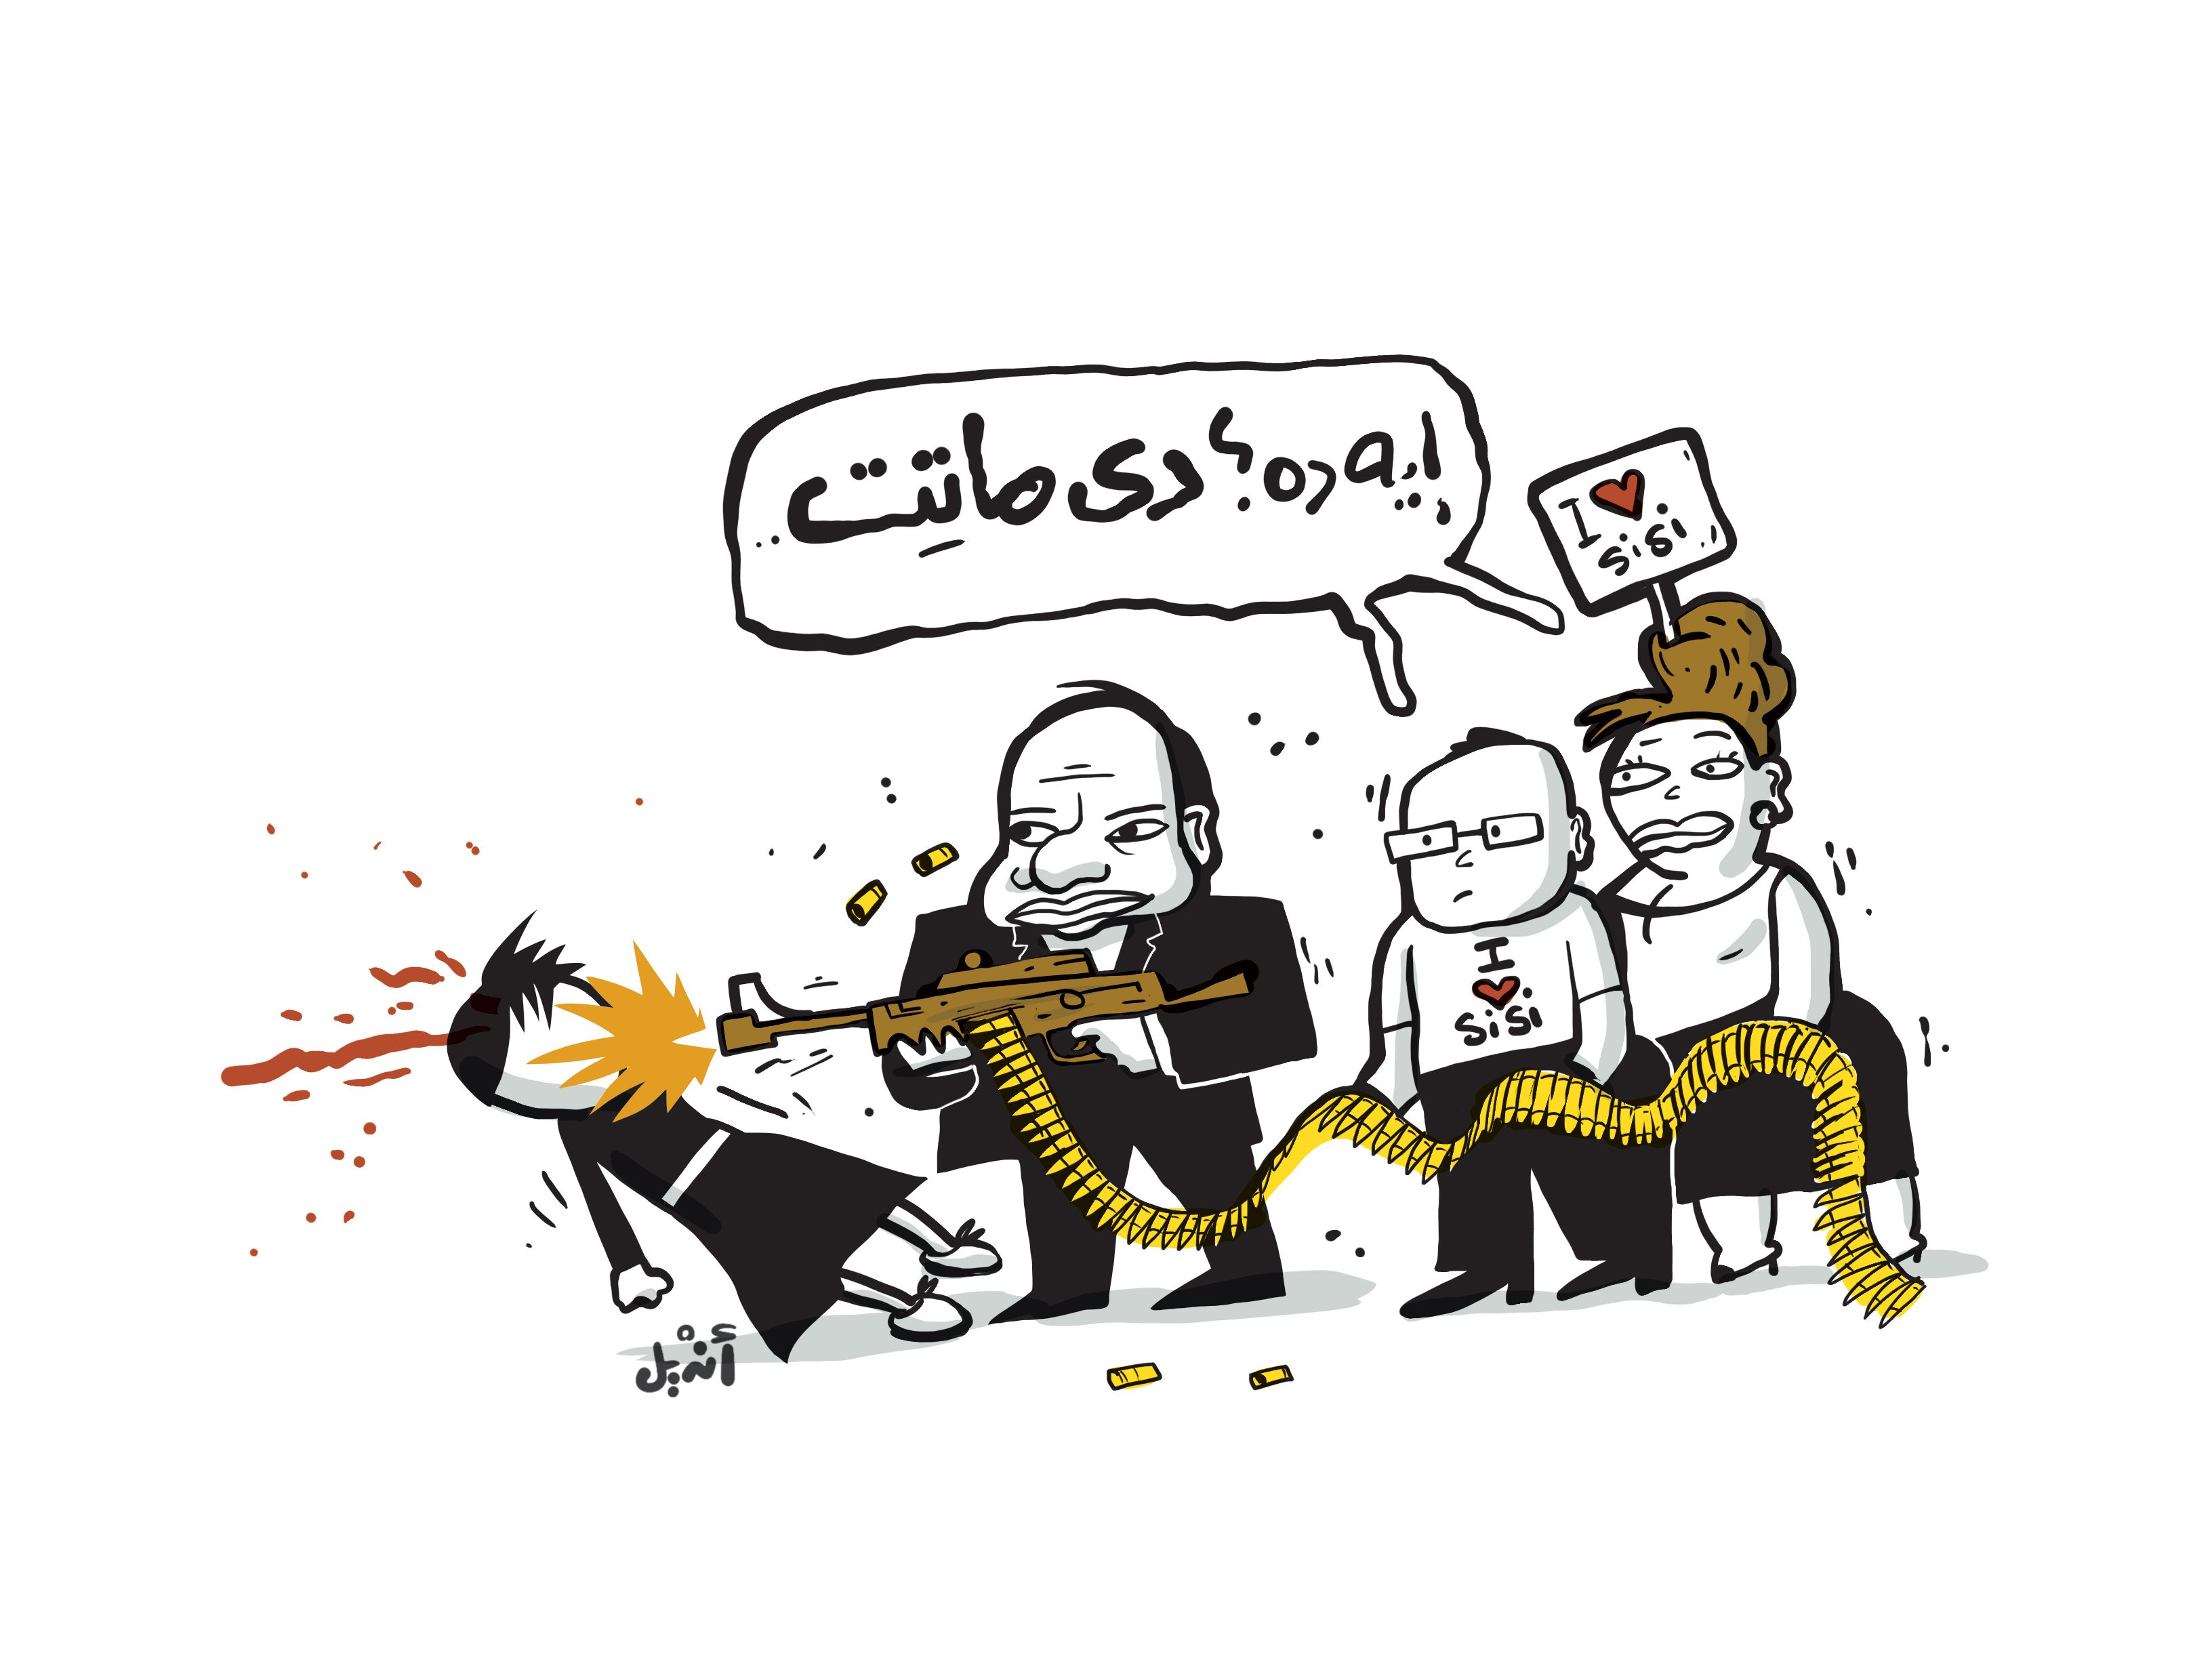 Cartoon: The woman died